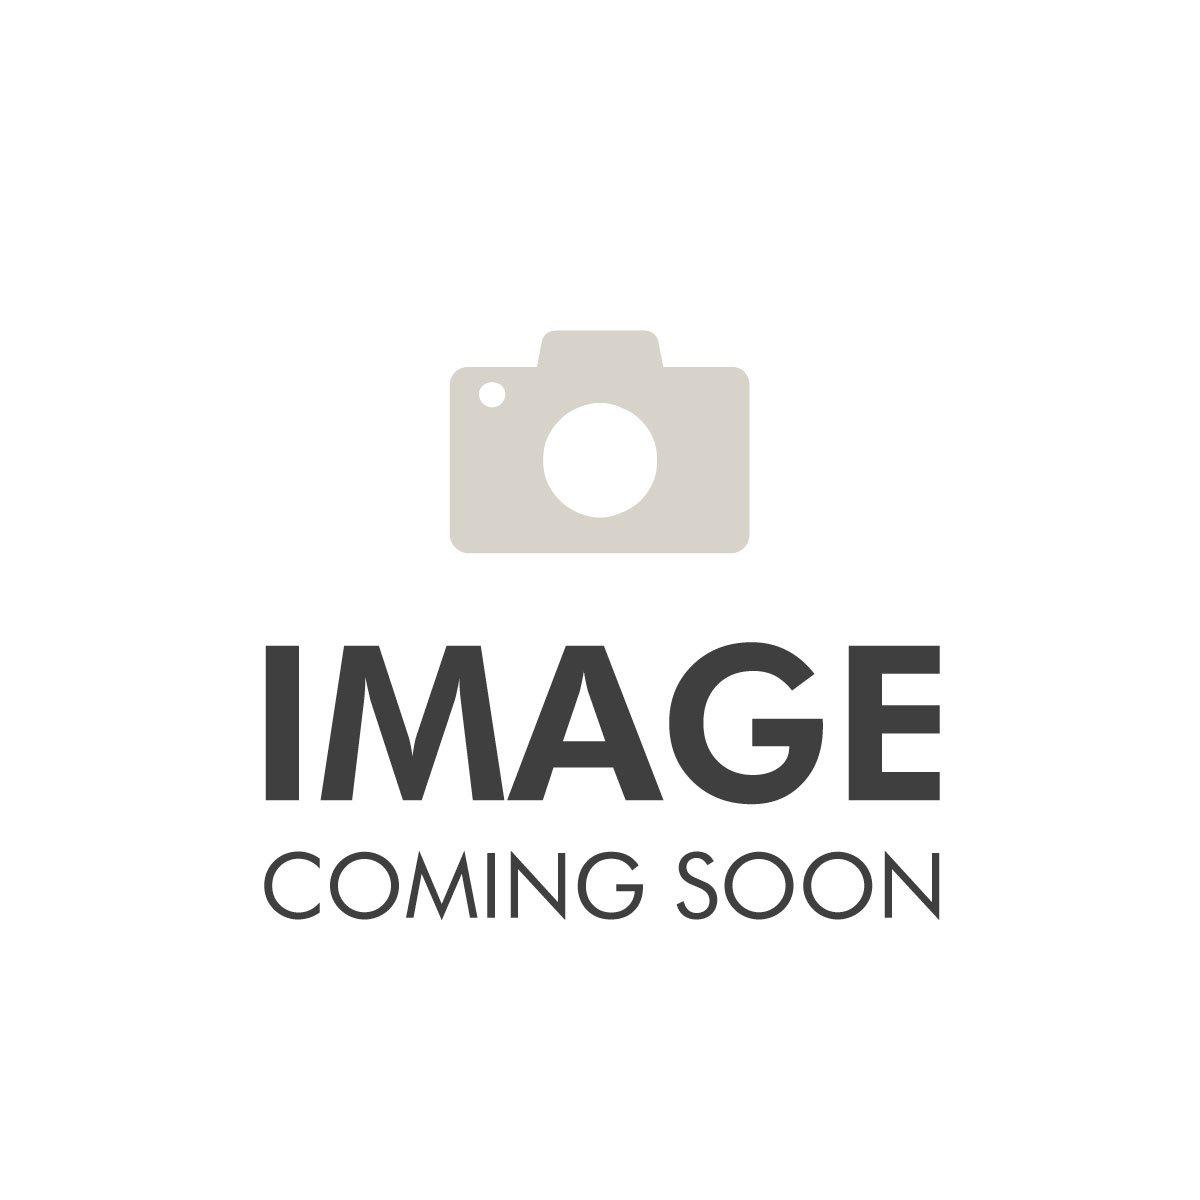 Thierry Mugler Angel Eau De Parfum 25ml Refillable Spray